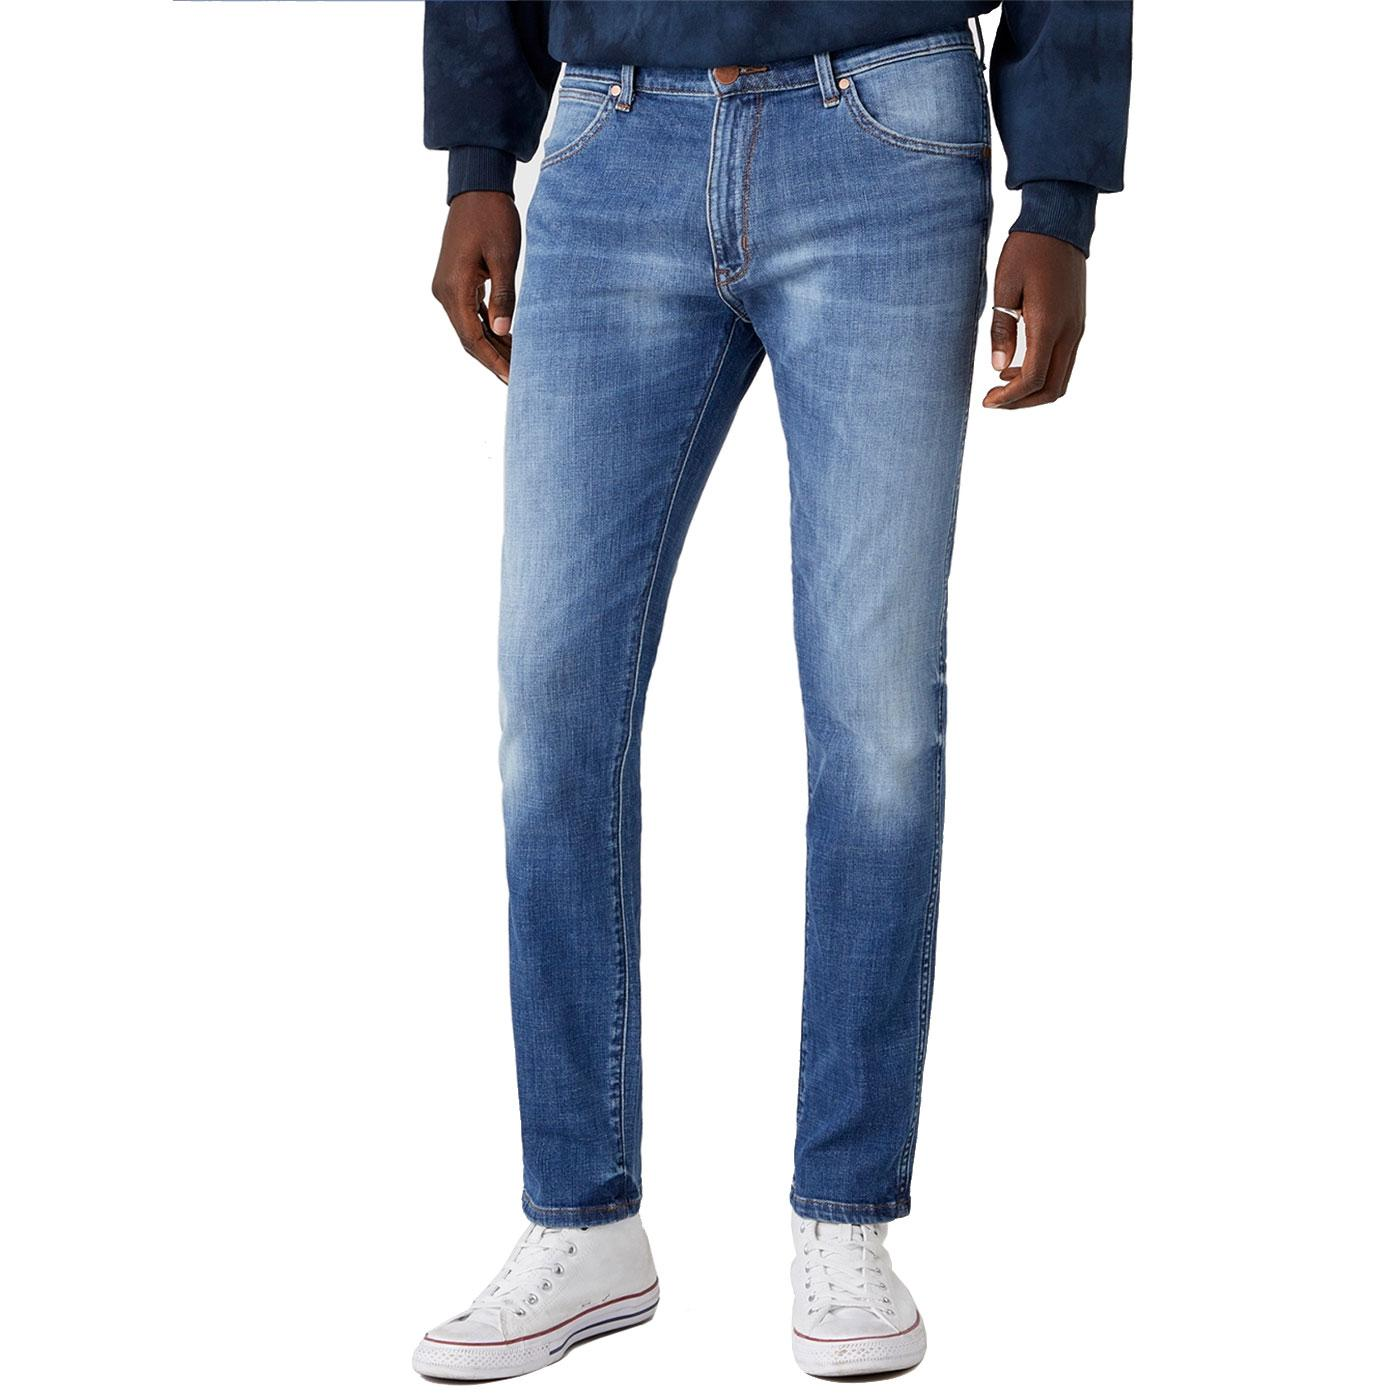 Larston WRANGLER Slim Tapered Jeans - De-Lite